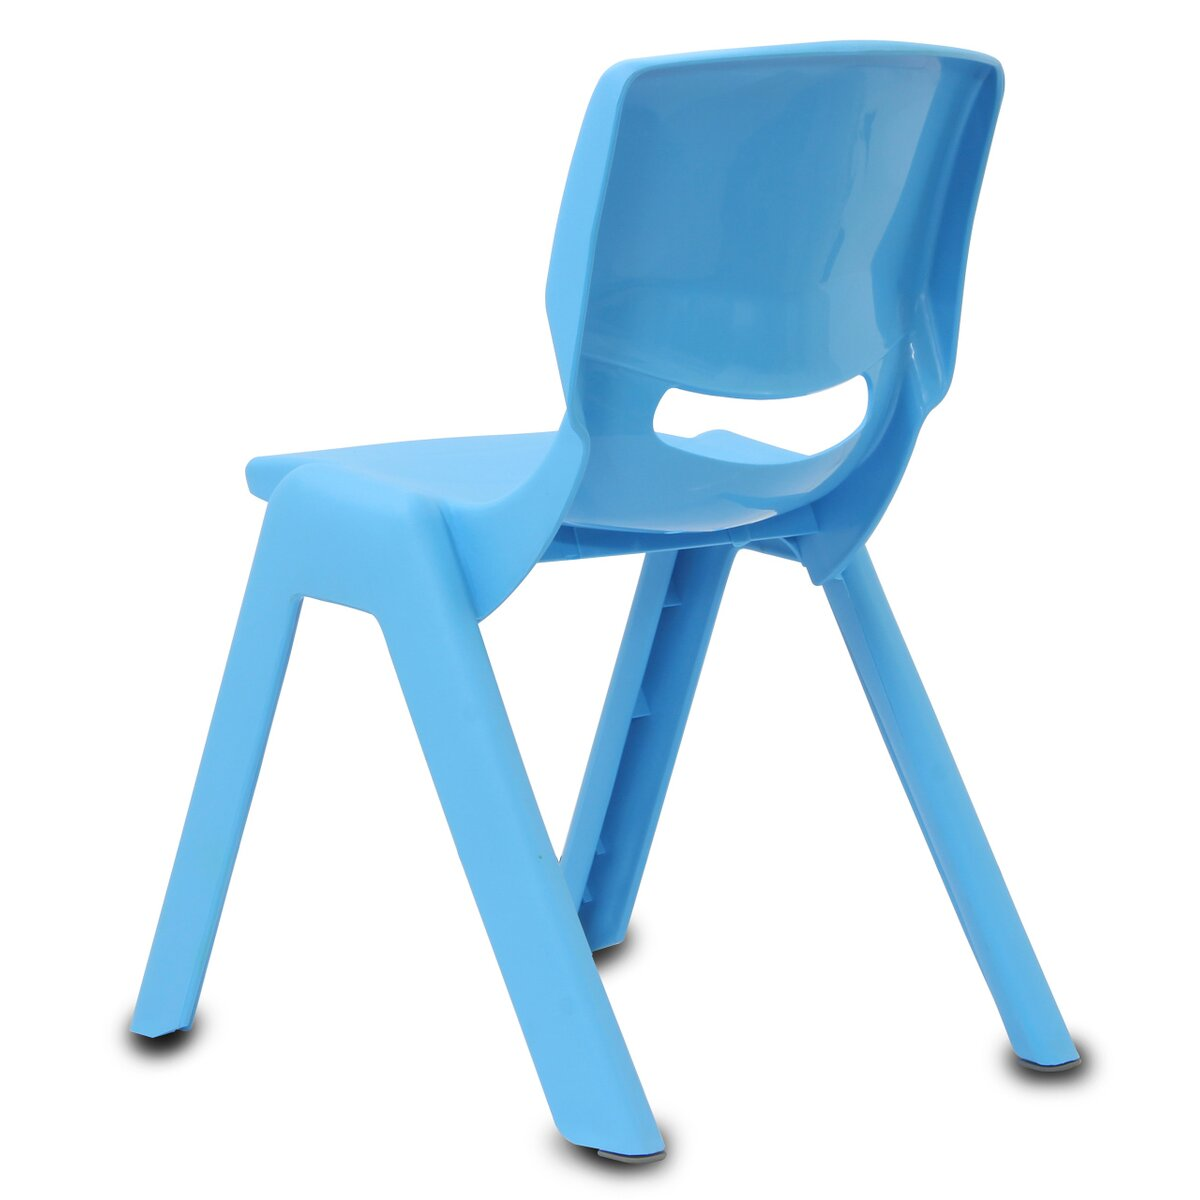 Jamara Dětská židle Smiley do 100 KG modrá